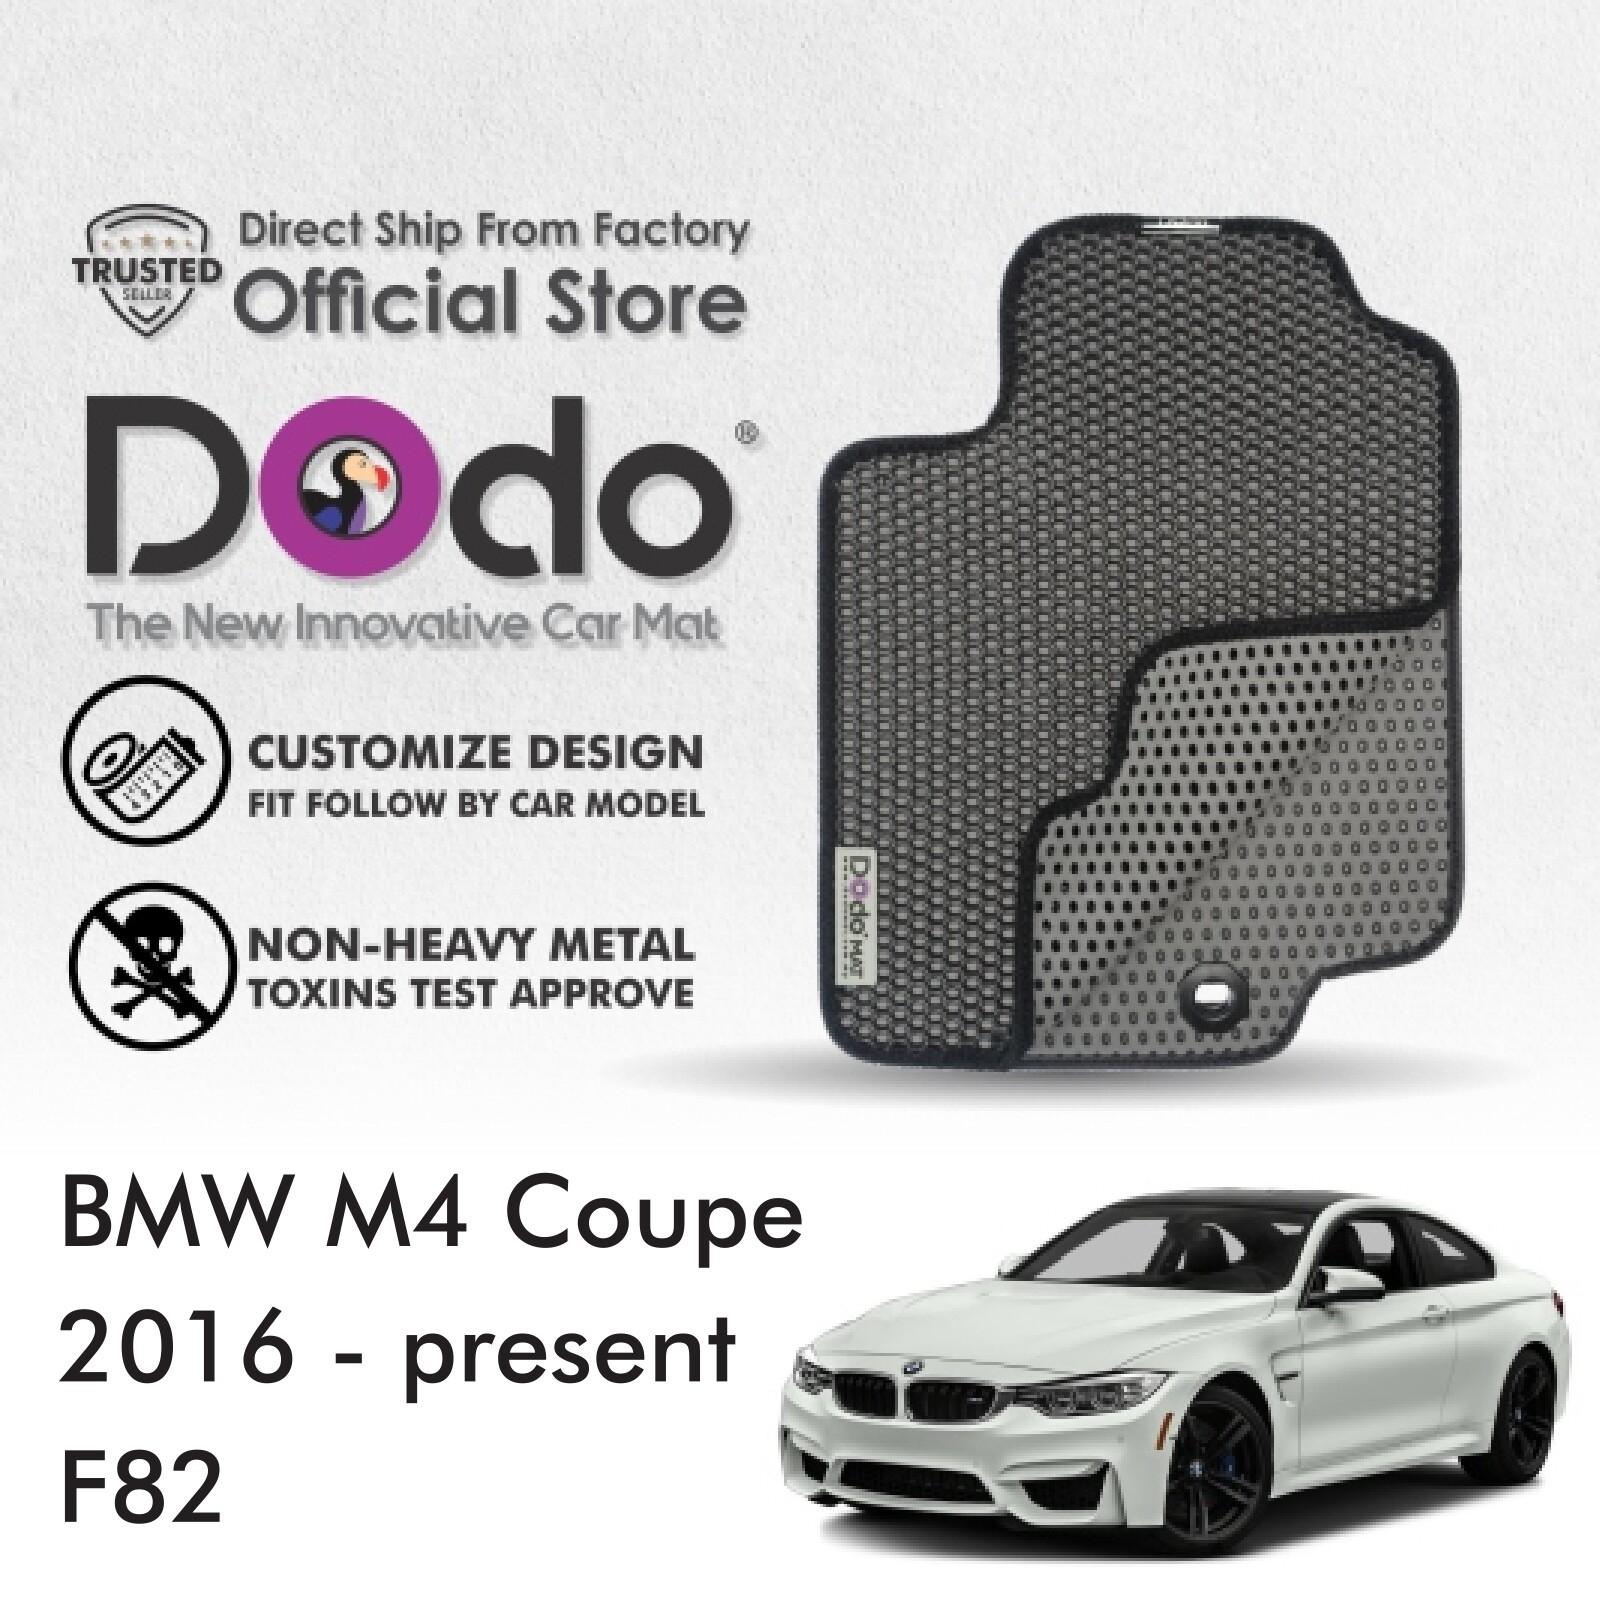 Dodo® Car Mat / BMW M4 Coupe / 2016 - present / F82